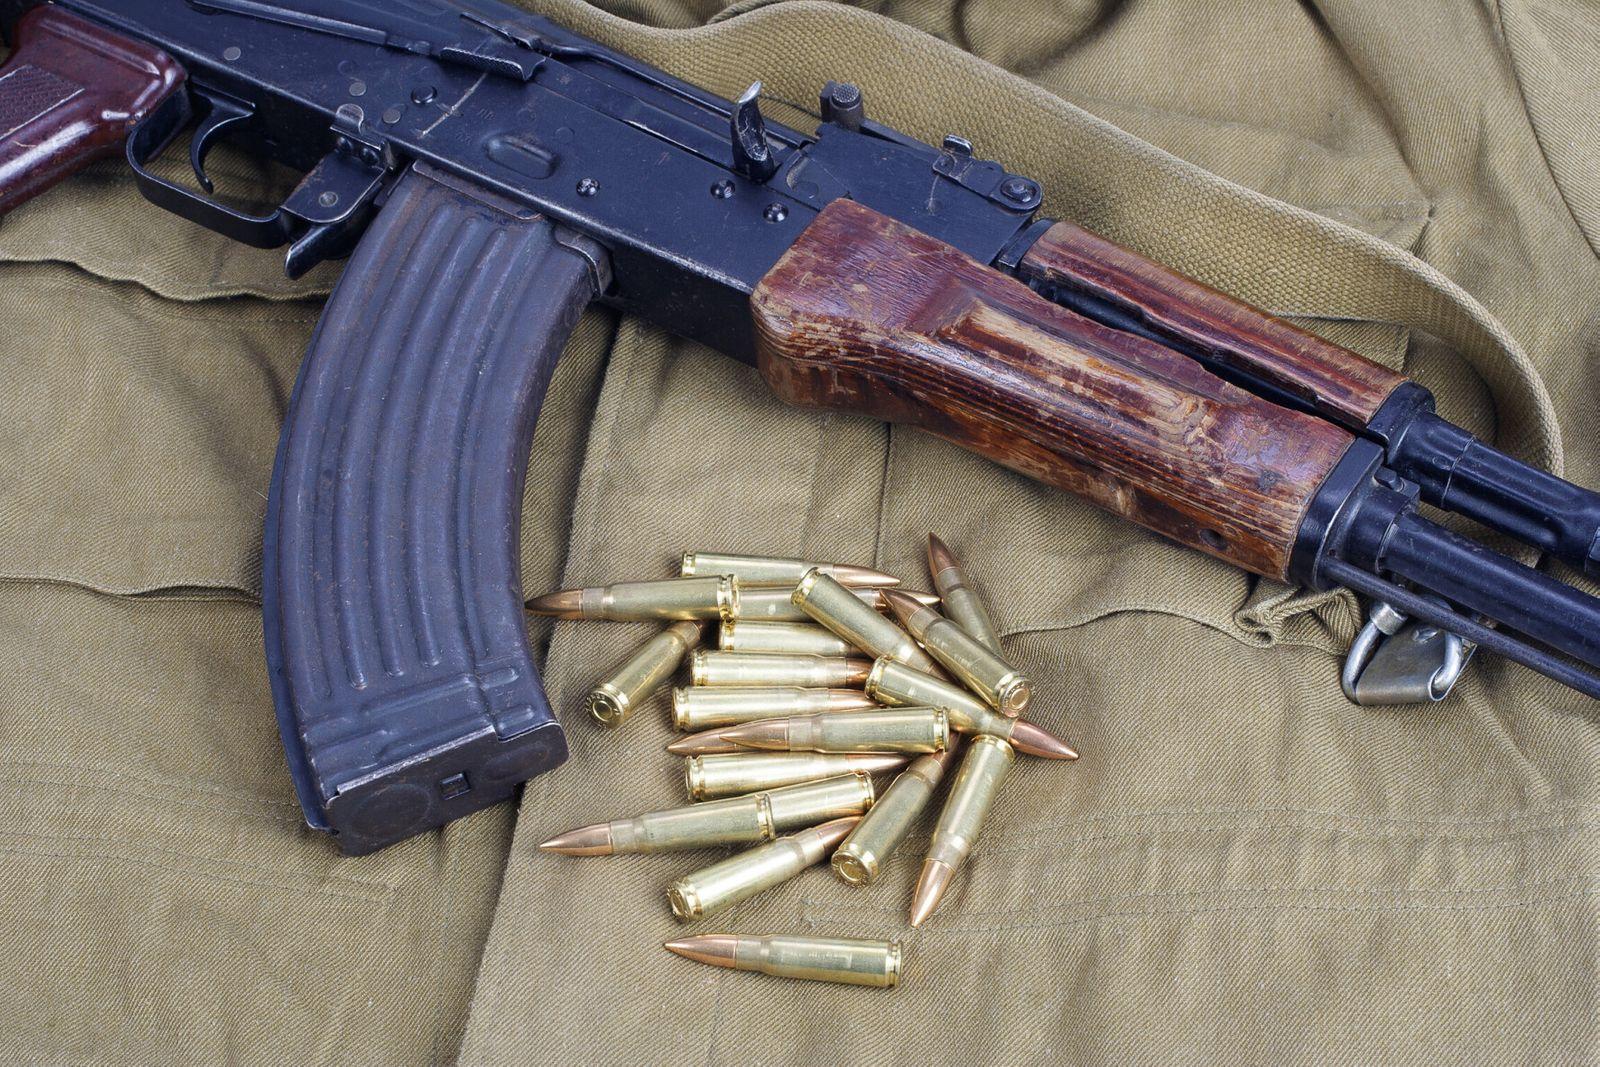 AK47 on khaki uniform background (zm23)